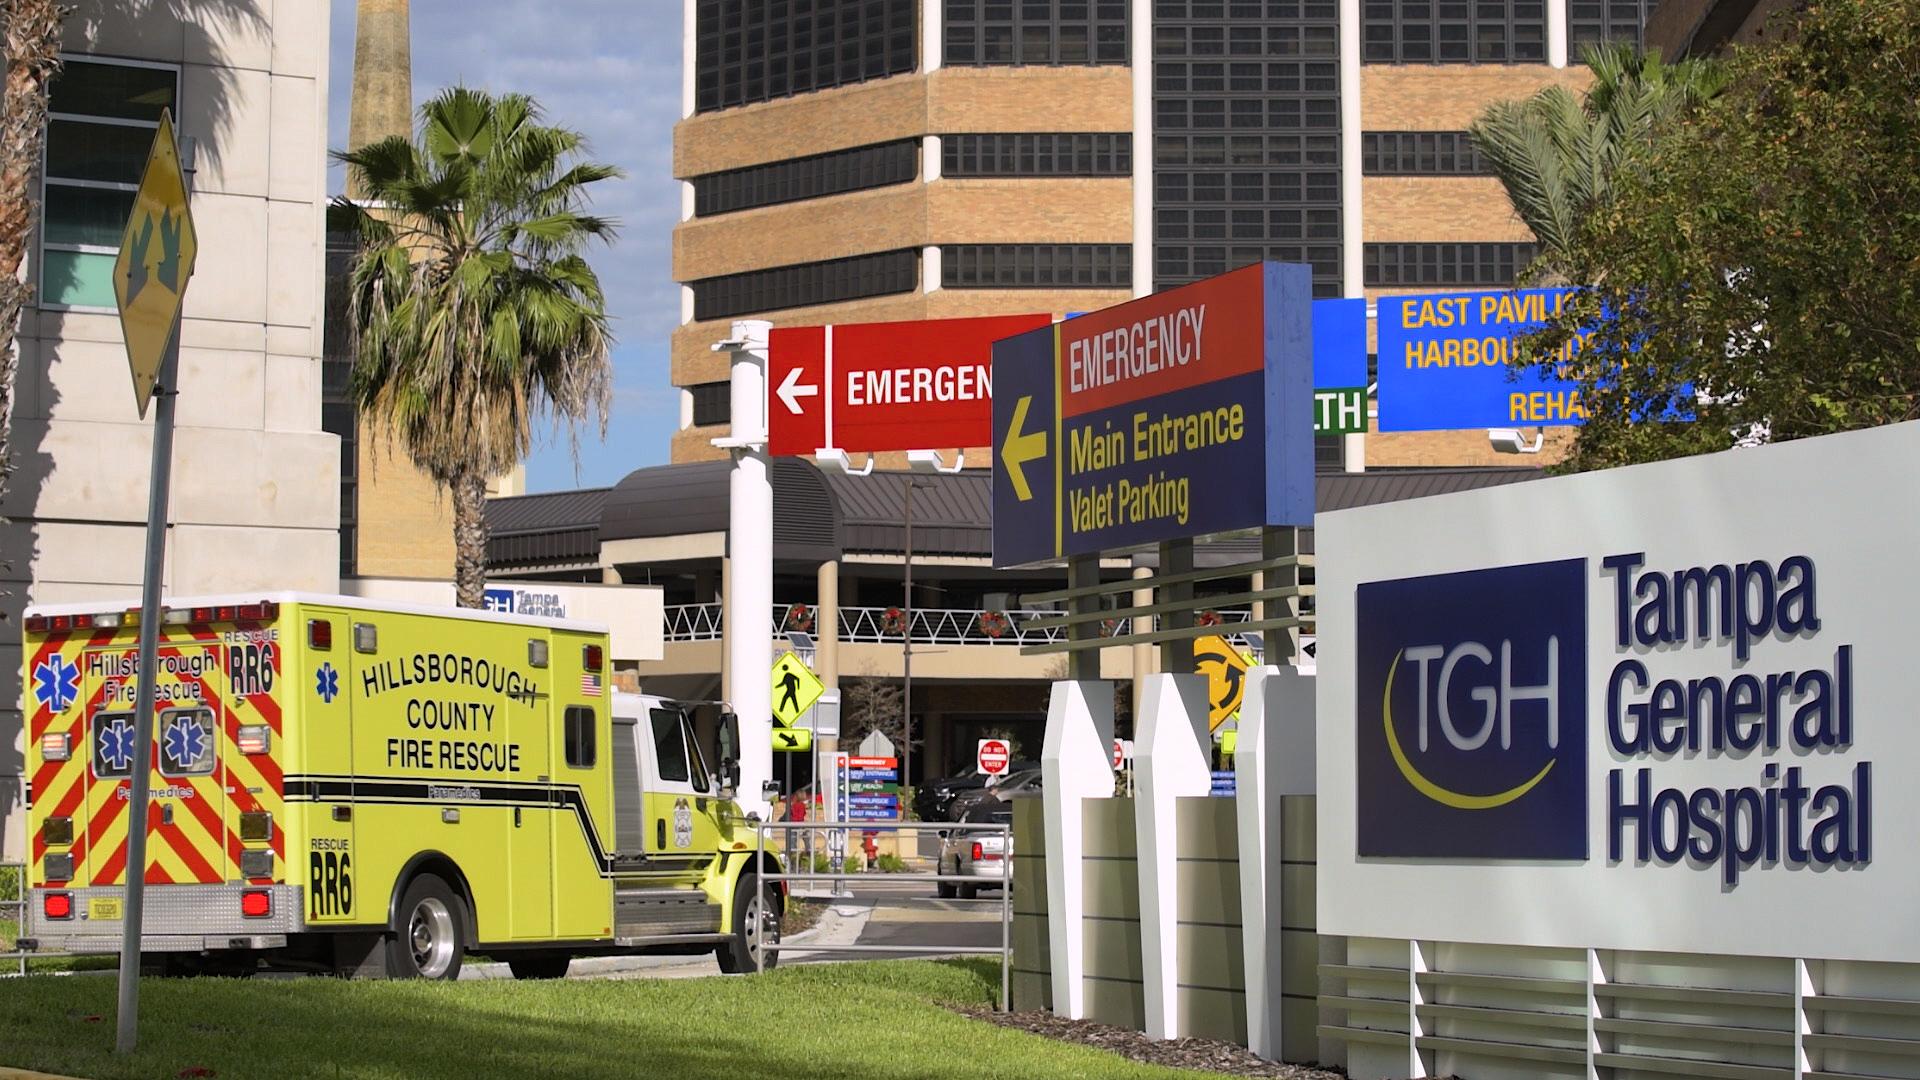 Tampa General Hospital emergency room entrance